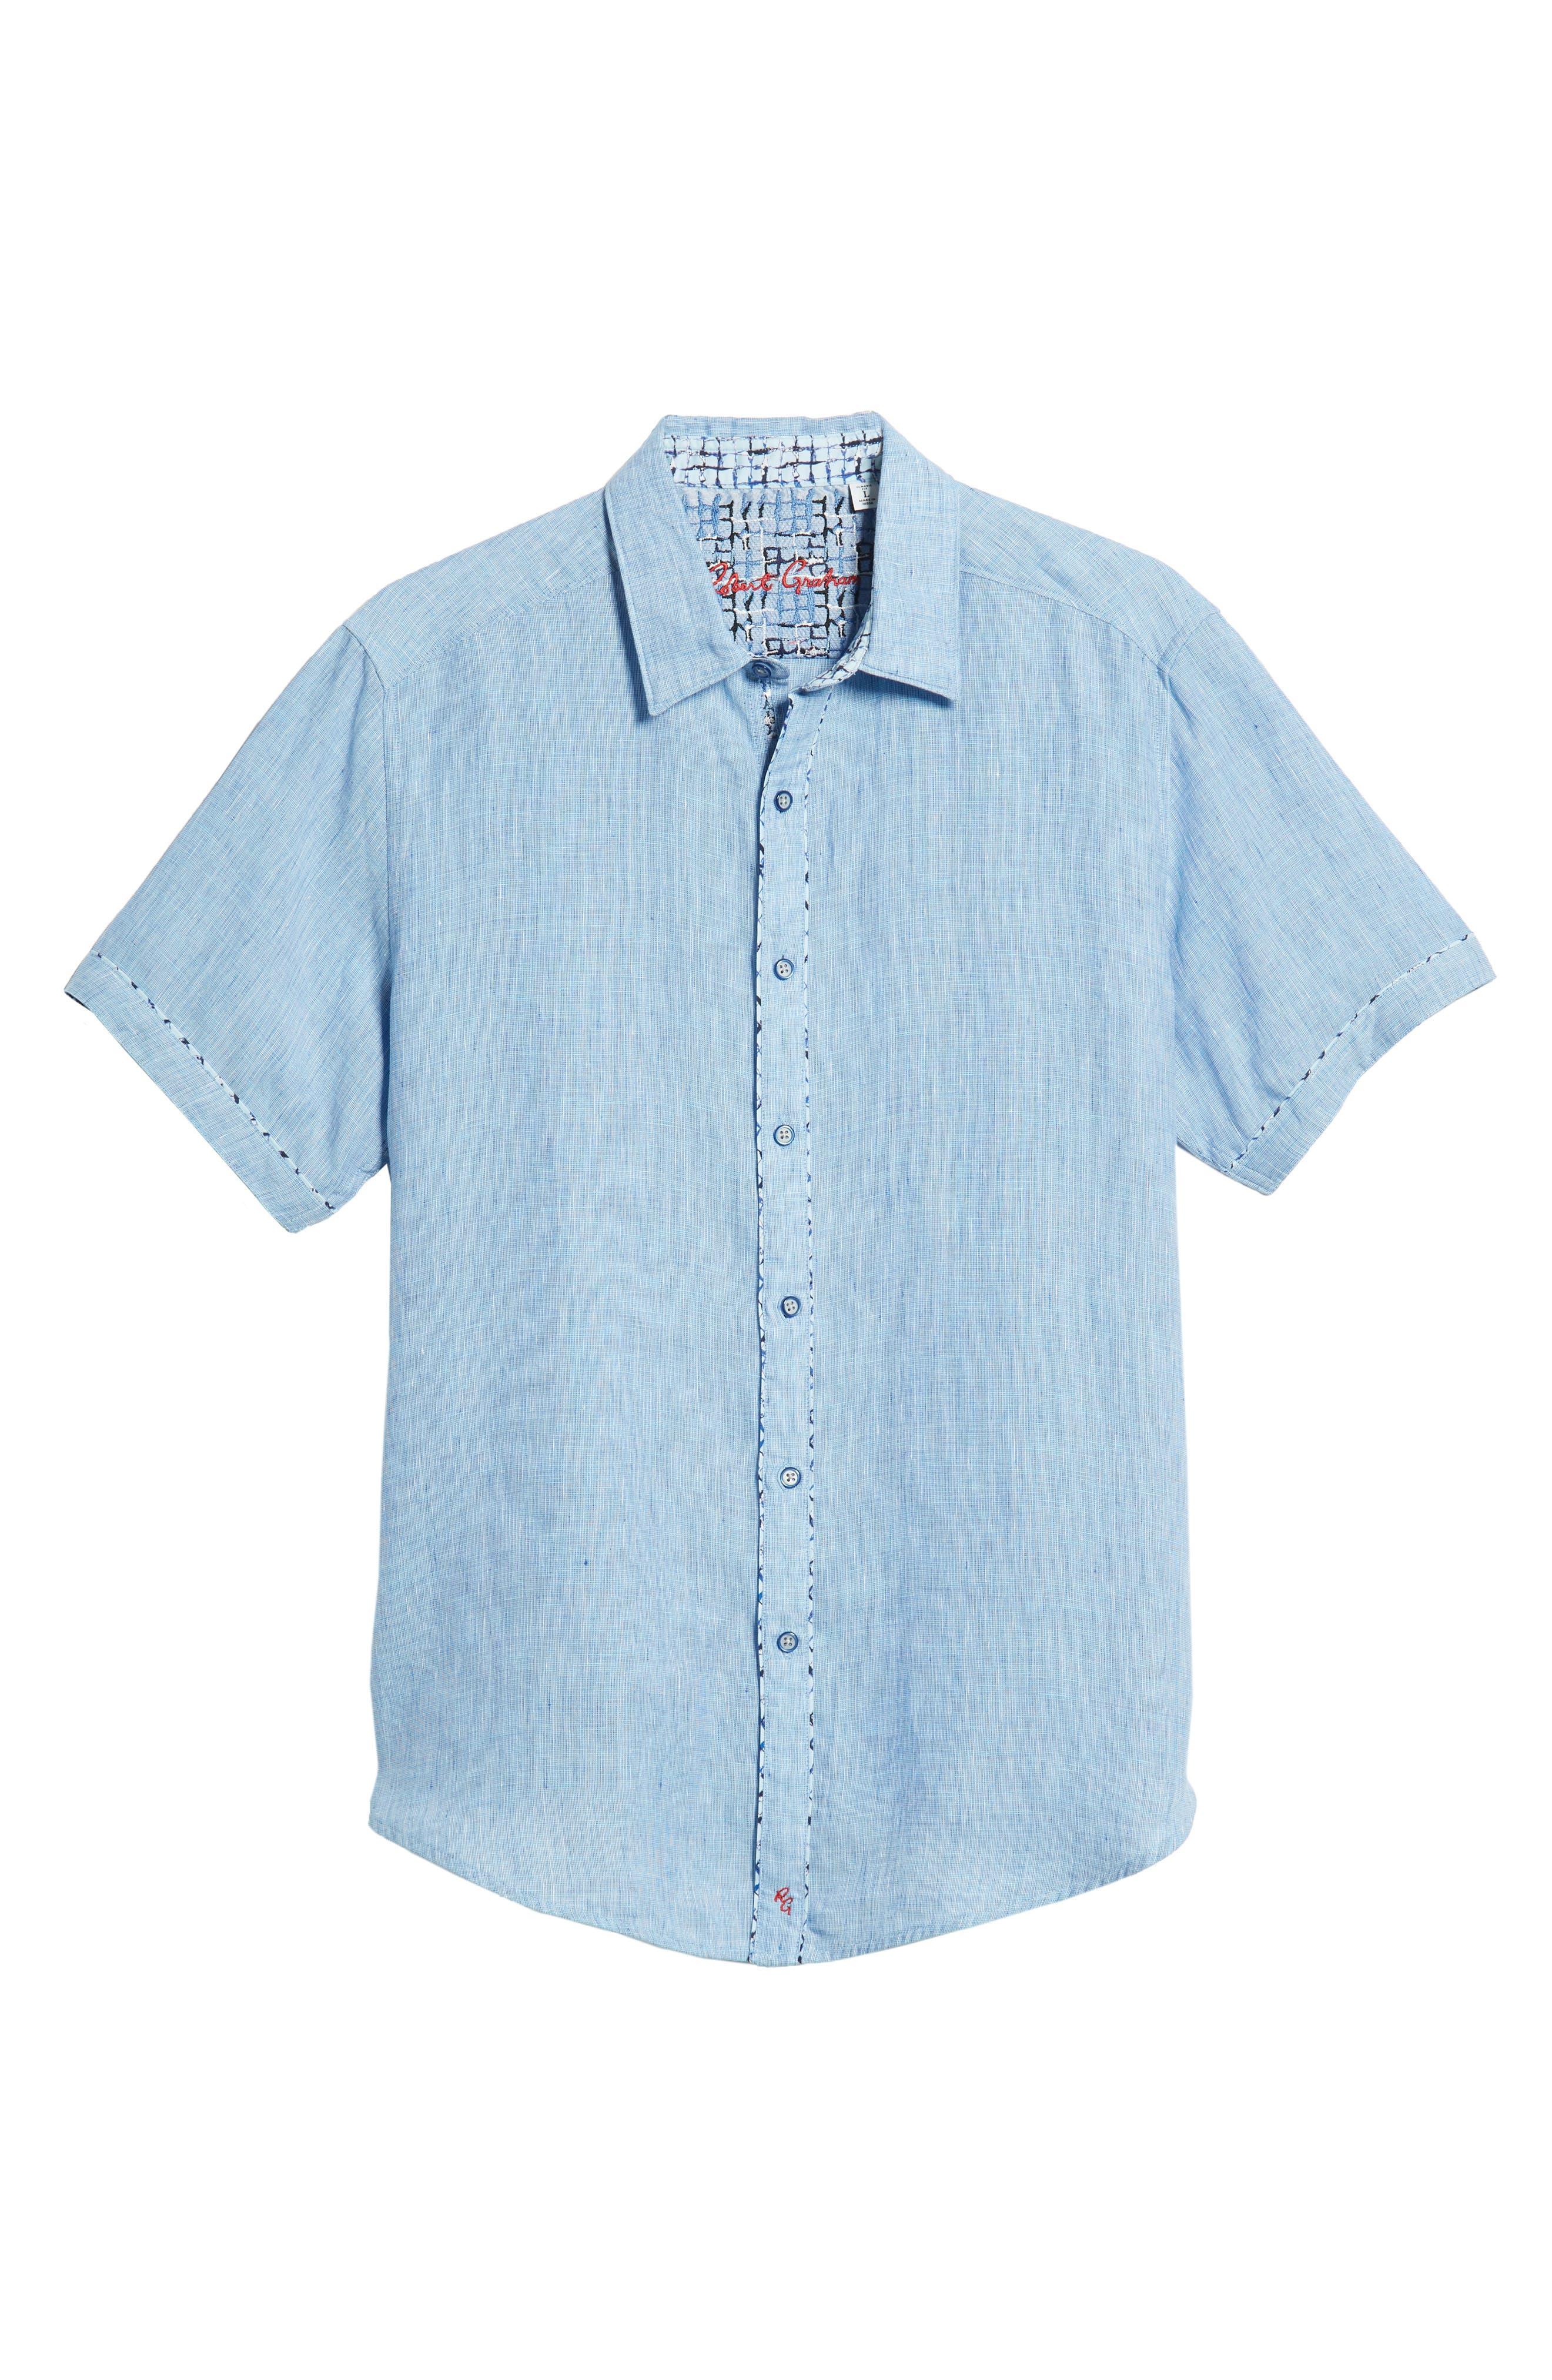 Gills Classic Fit Linen Sport Shirt,                             Alternate thumbnail 5, color,                             LIGHT BLUE